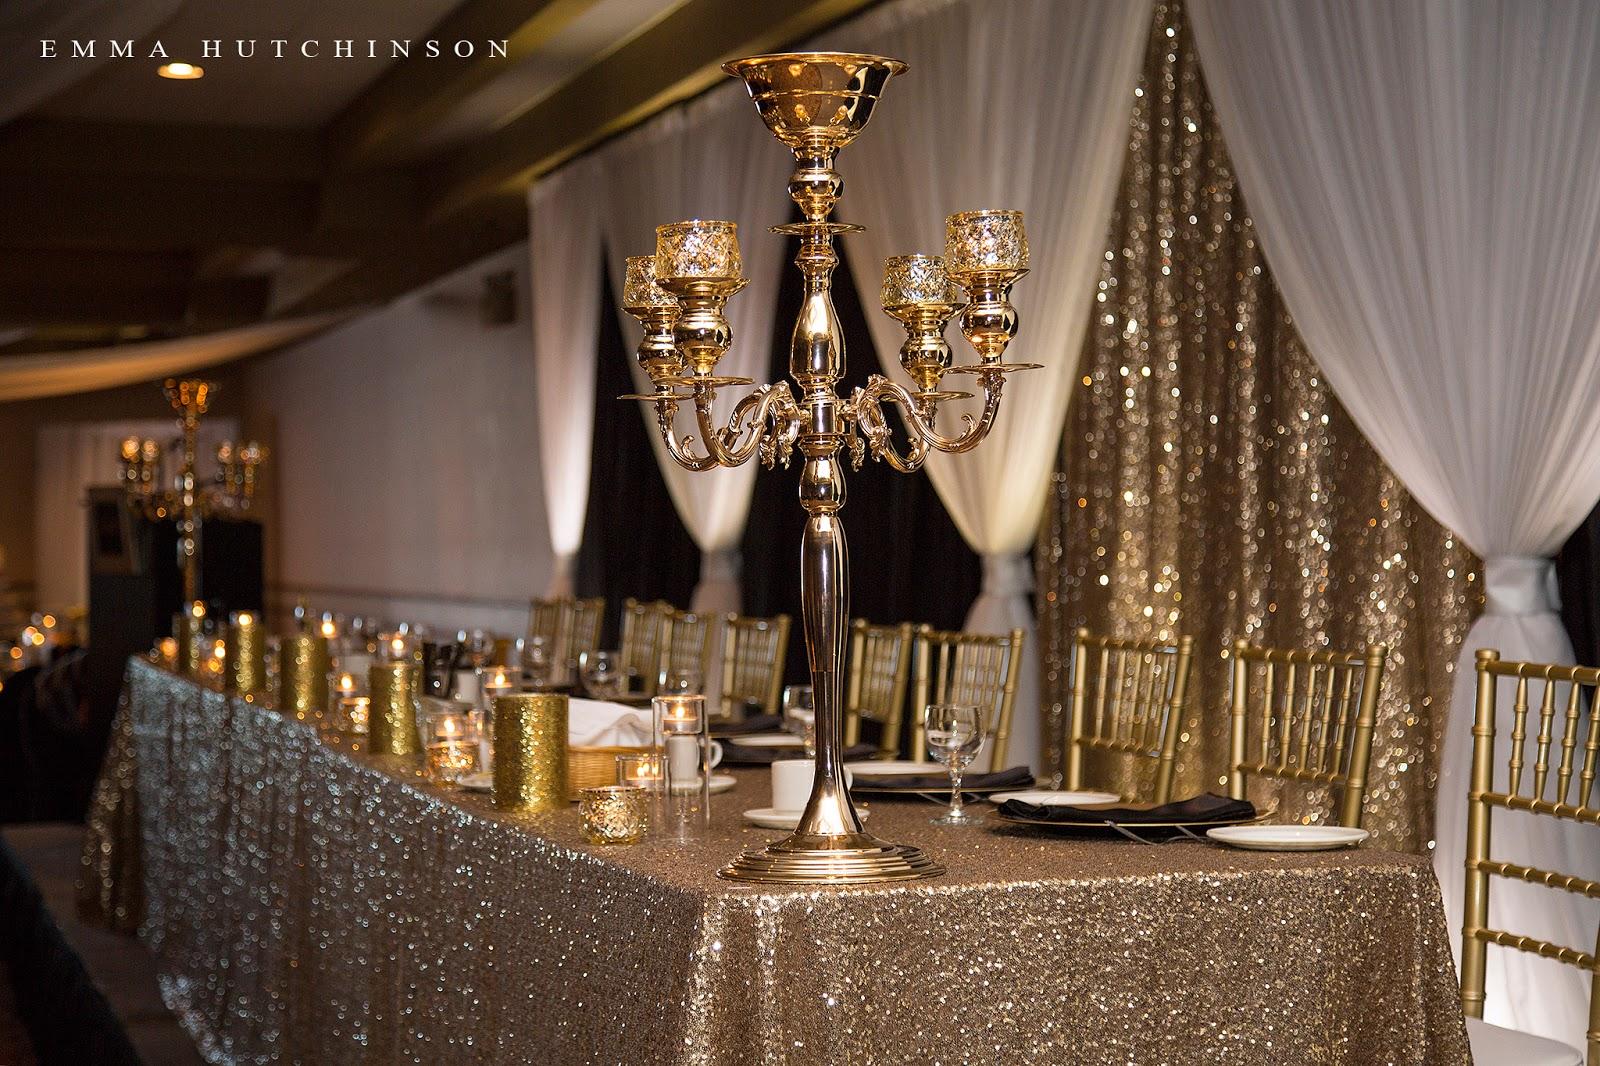 Central Newfoundland decor by Spotlight Events - wedding photography by Emma Hutchinson